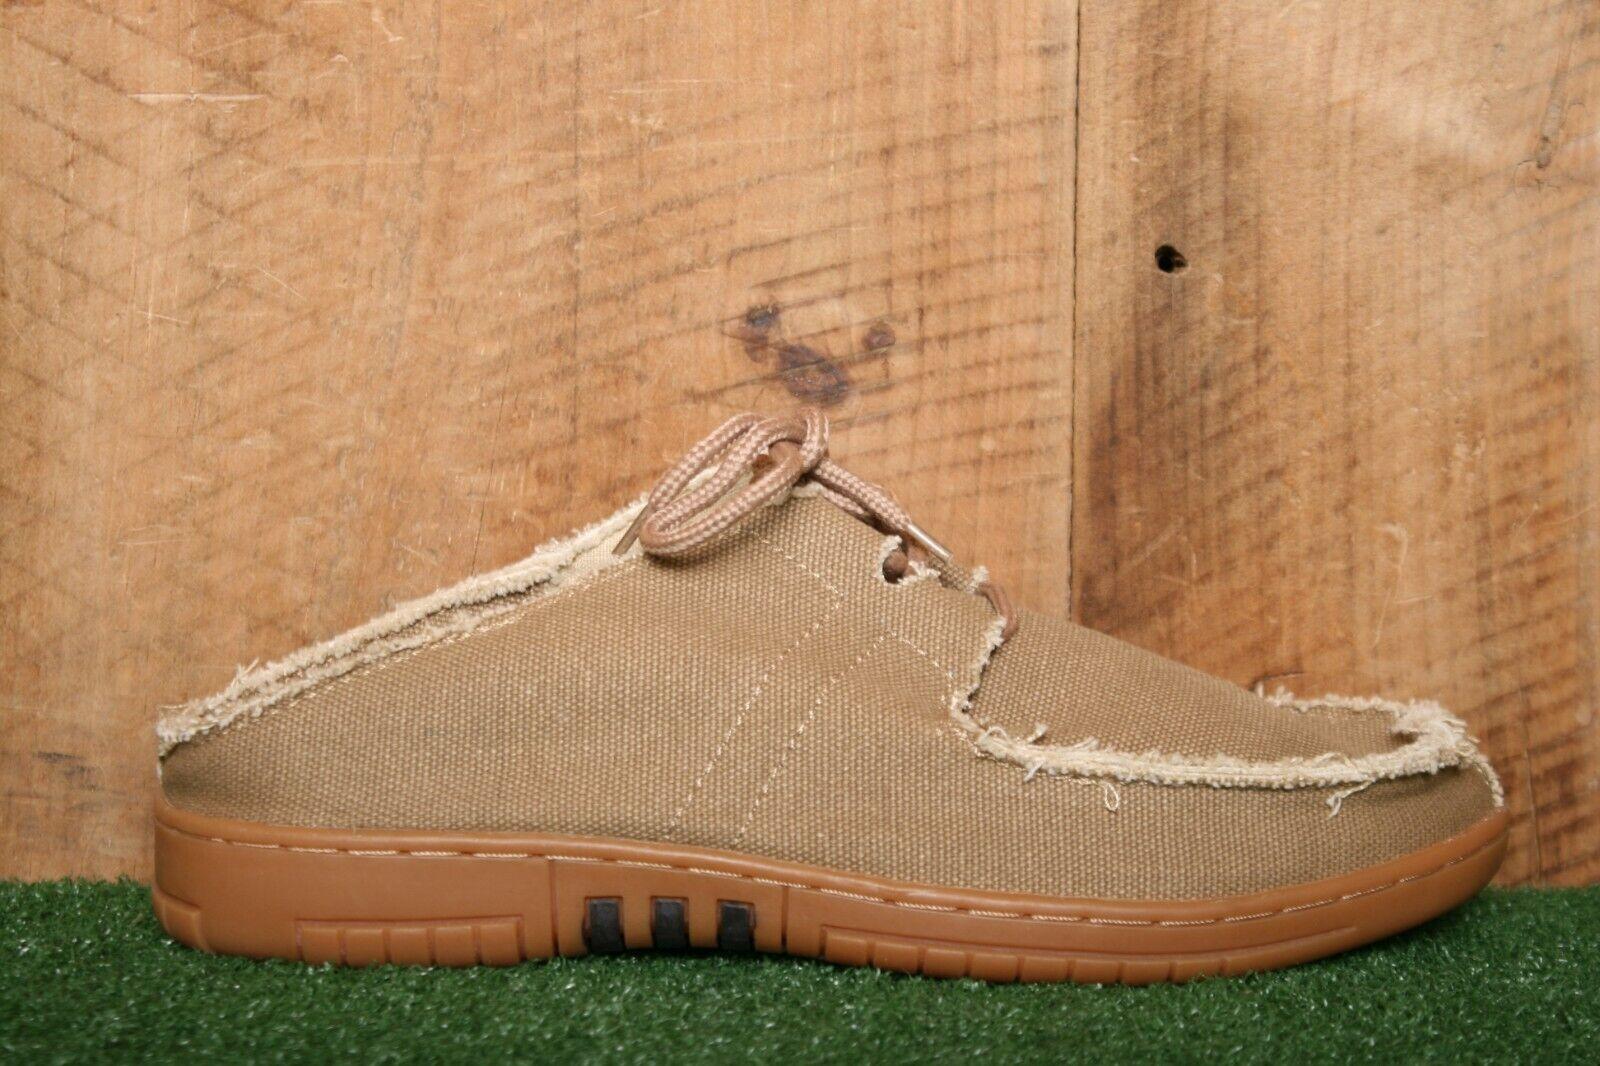 OLD FRIEND 'Jake' Khaki Canvas Slip-On Peace Moccasins Sipper Shoe Men's Sz. 8.5